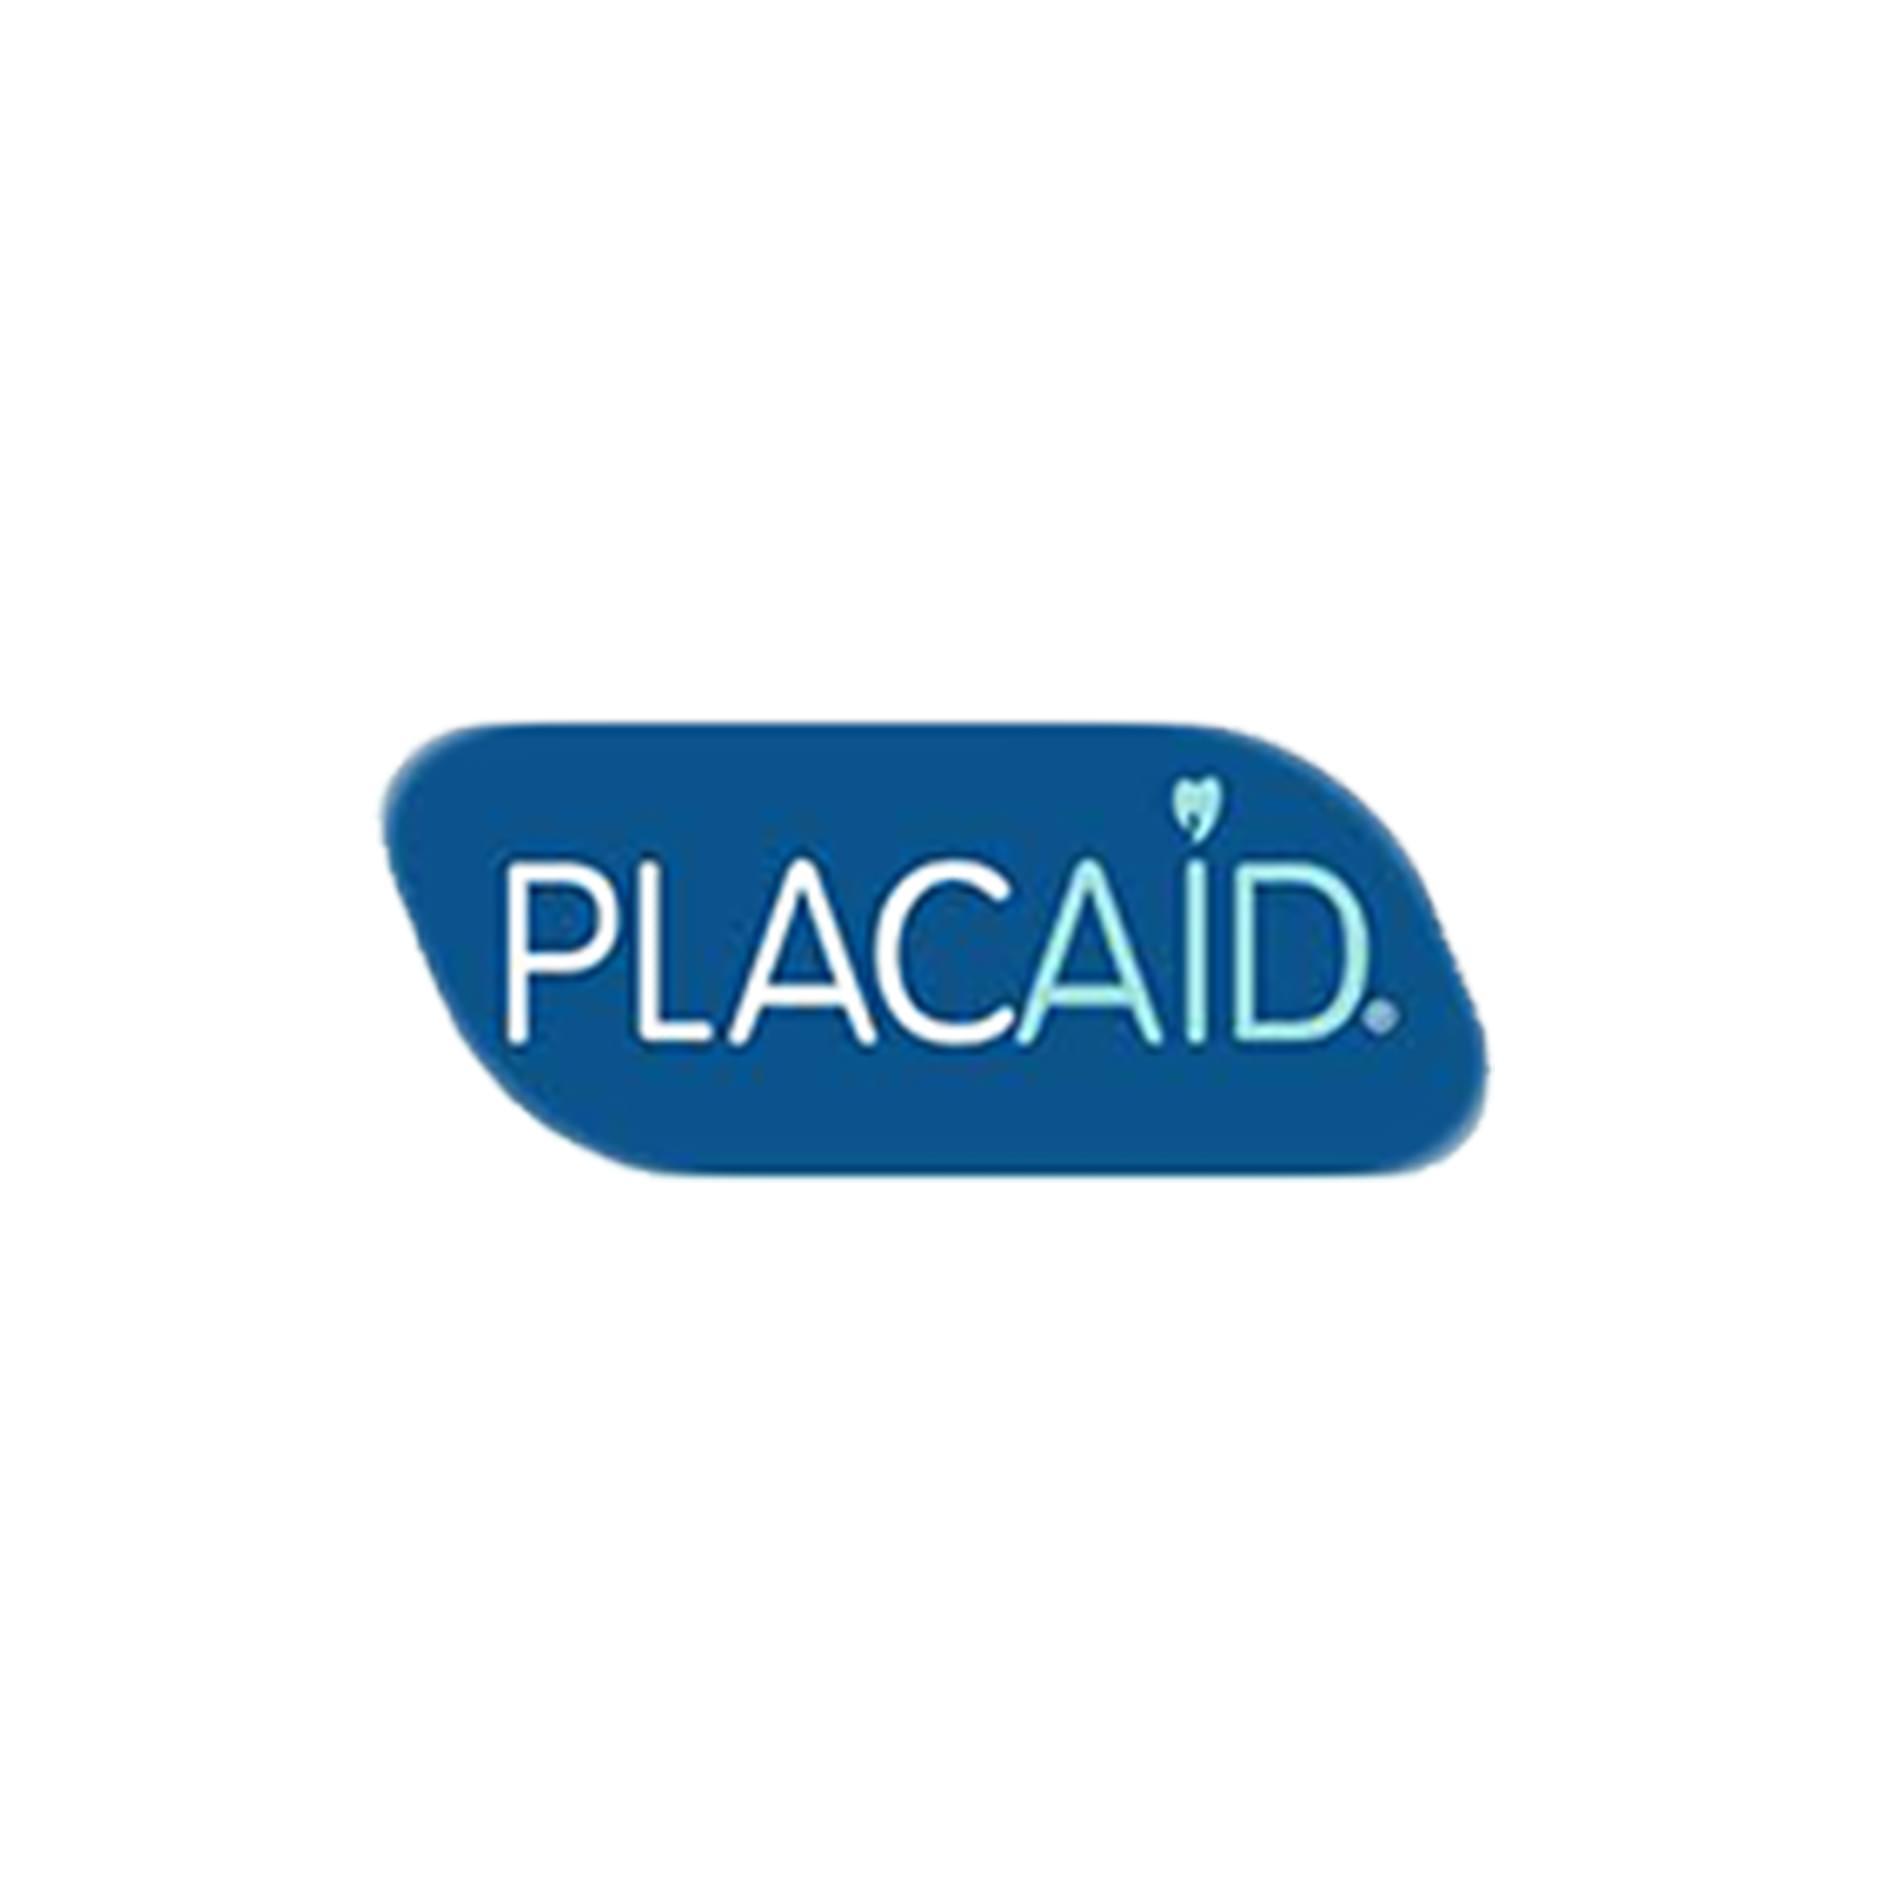 placaid_logo